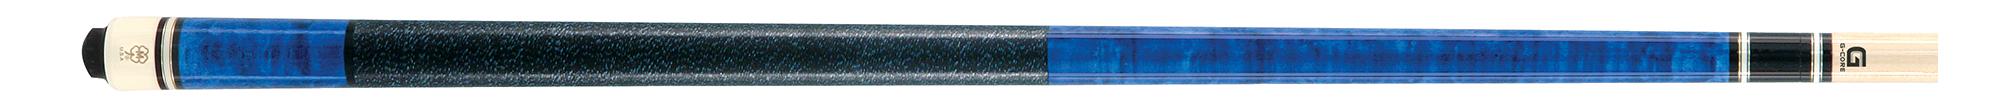 PK3000: McDermott G201 Pacific Blue pool Gewicht: 19Oz #1